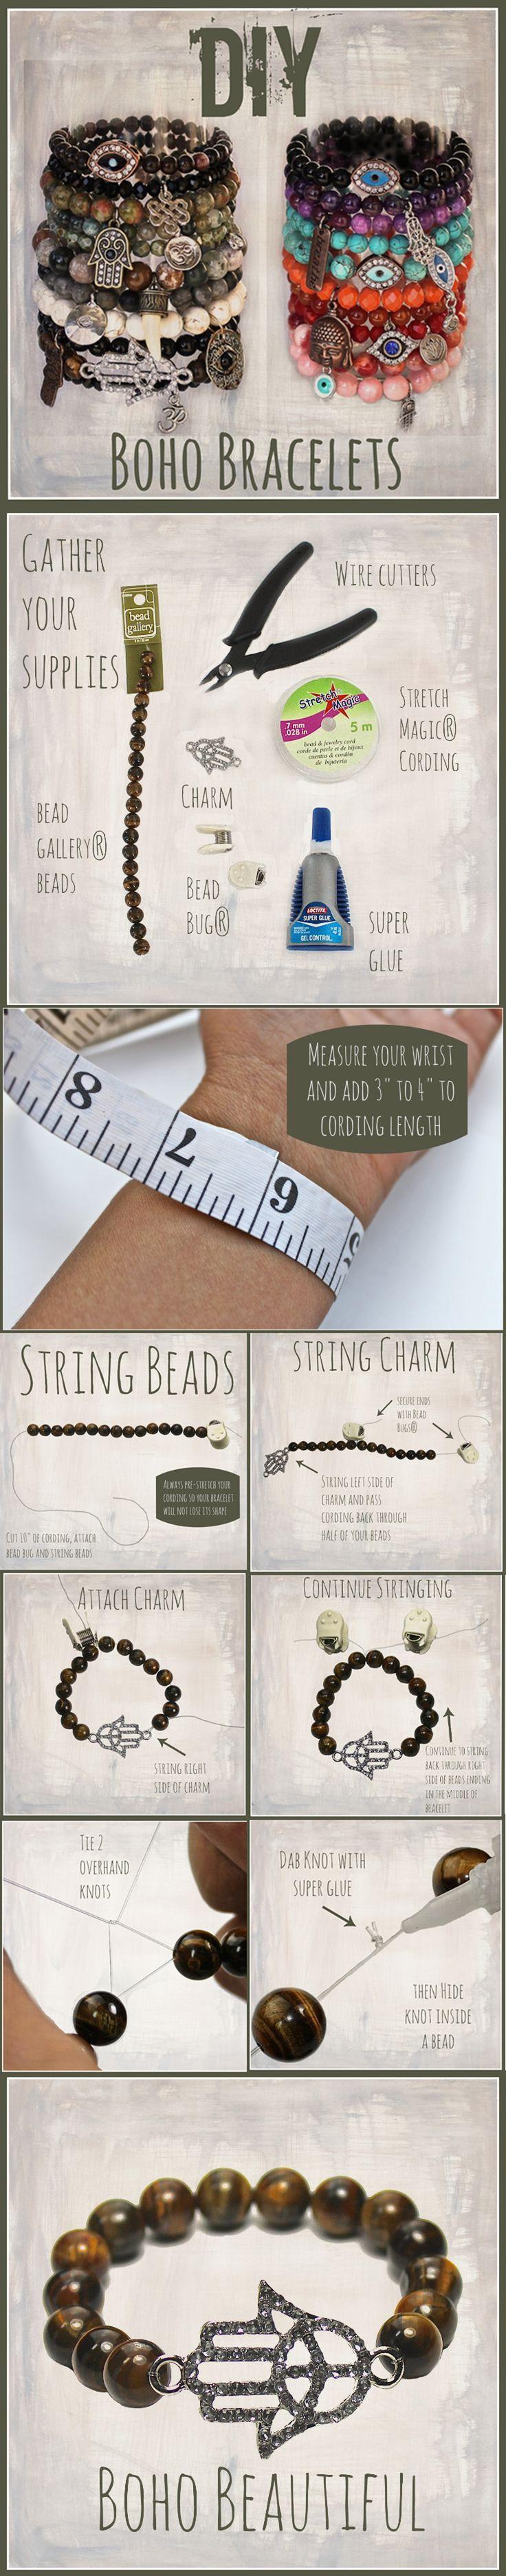 DIY Boho Beaded Bracelets